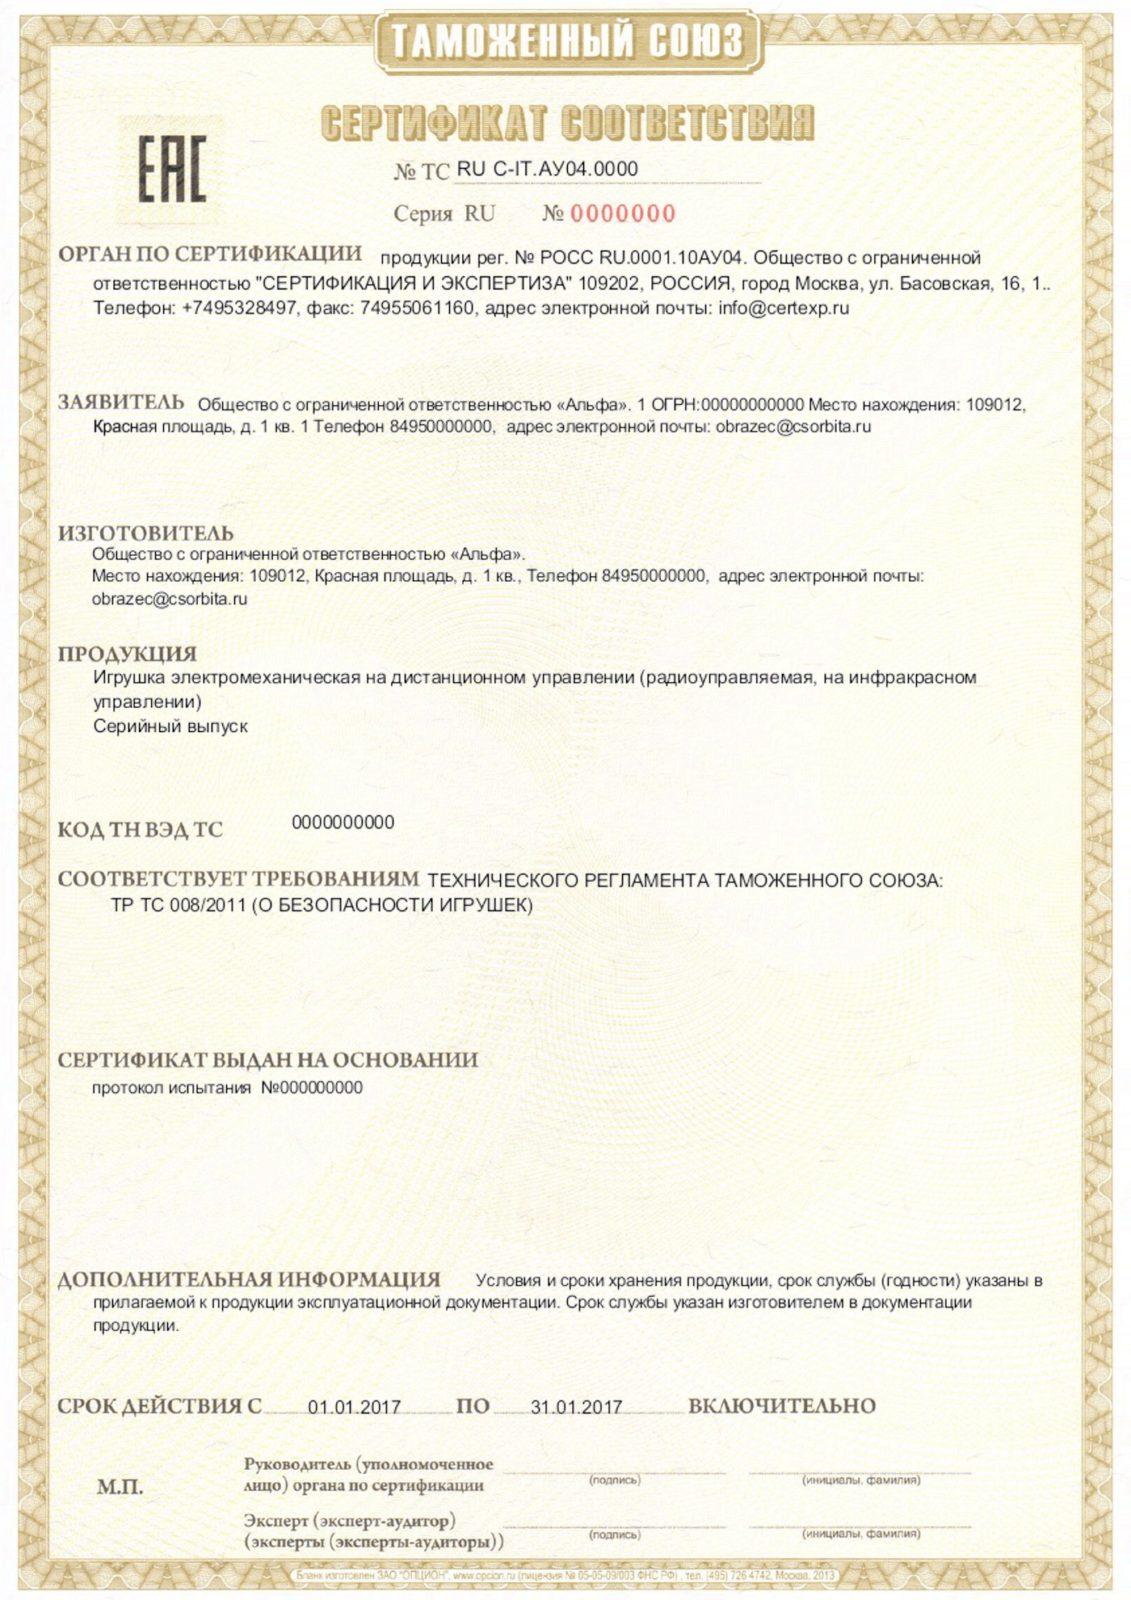 Сертификат тр тс картинки